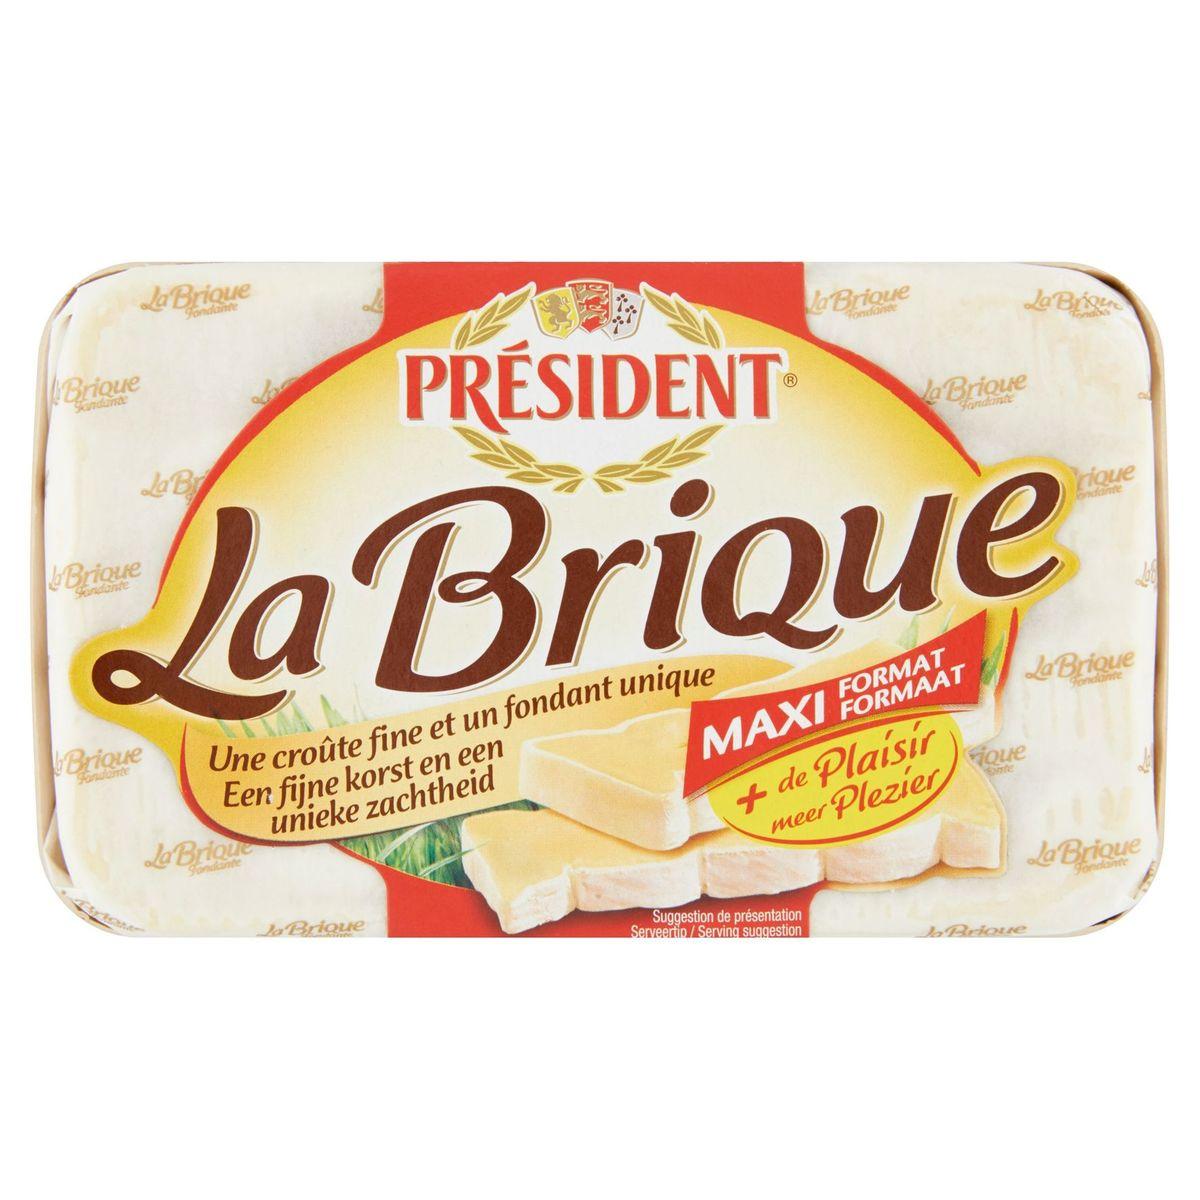 Président La Brique Fondante Maxi Format 220 g